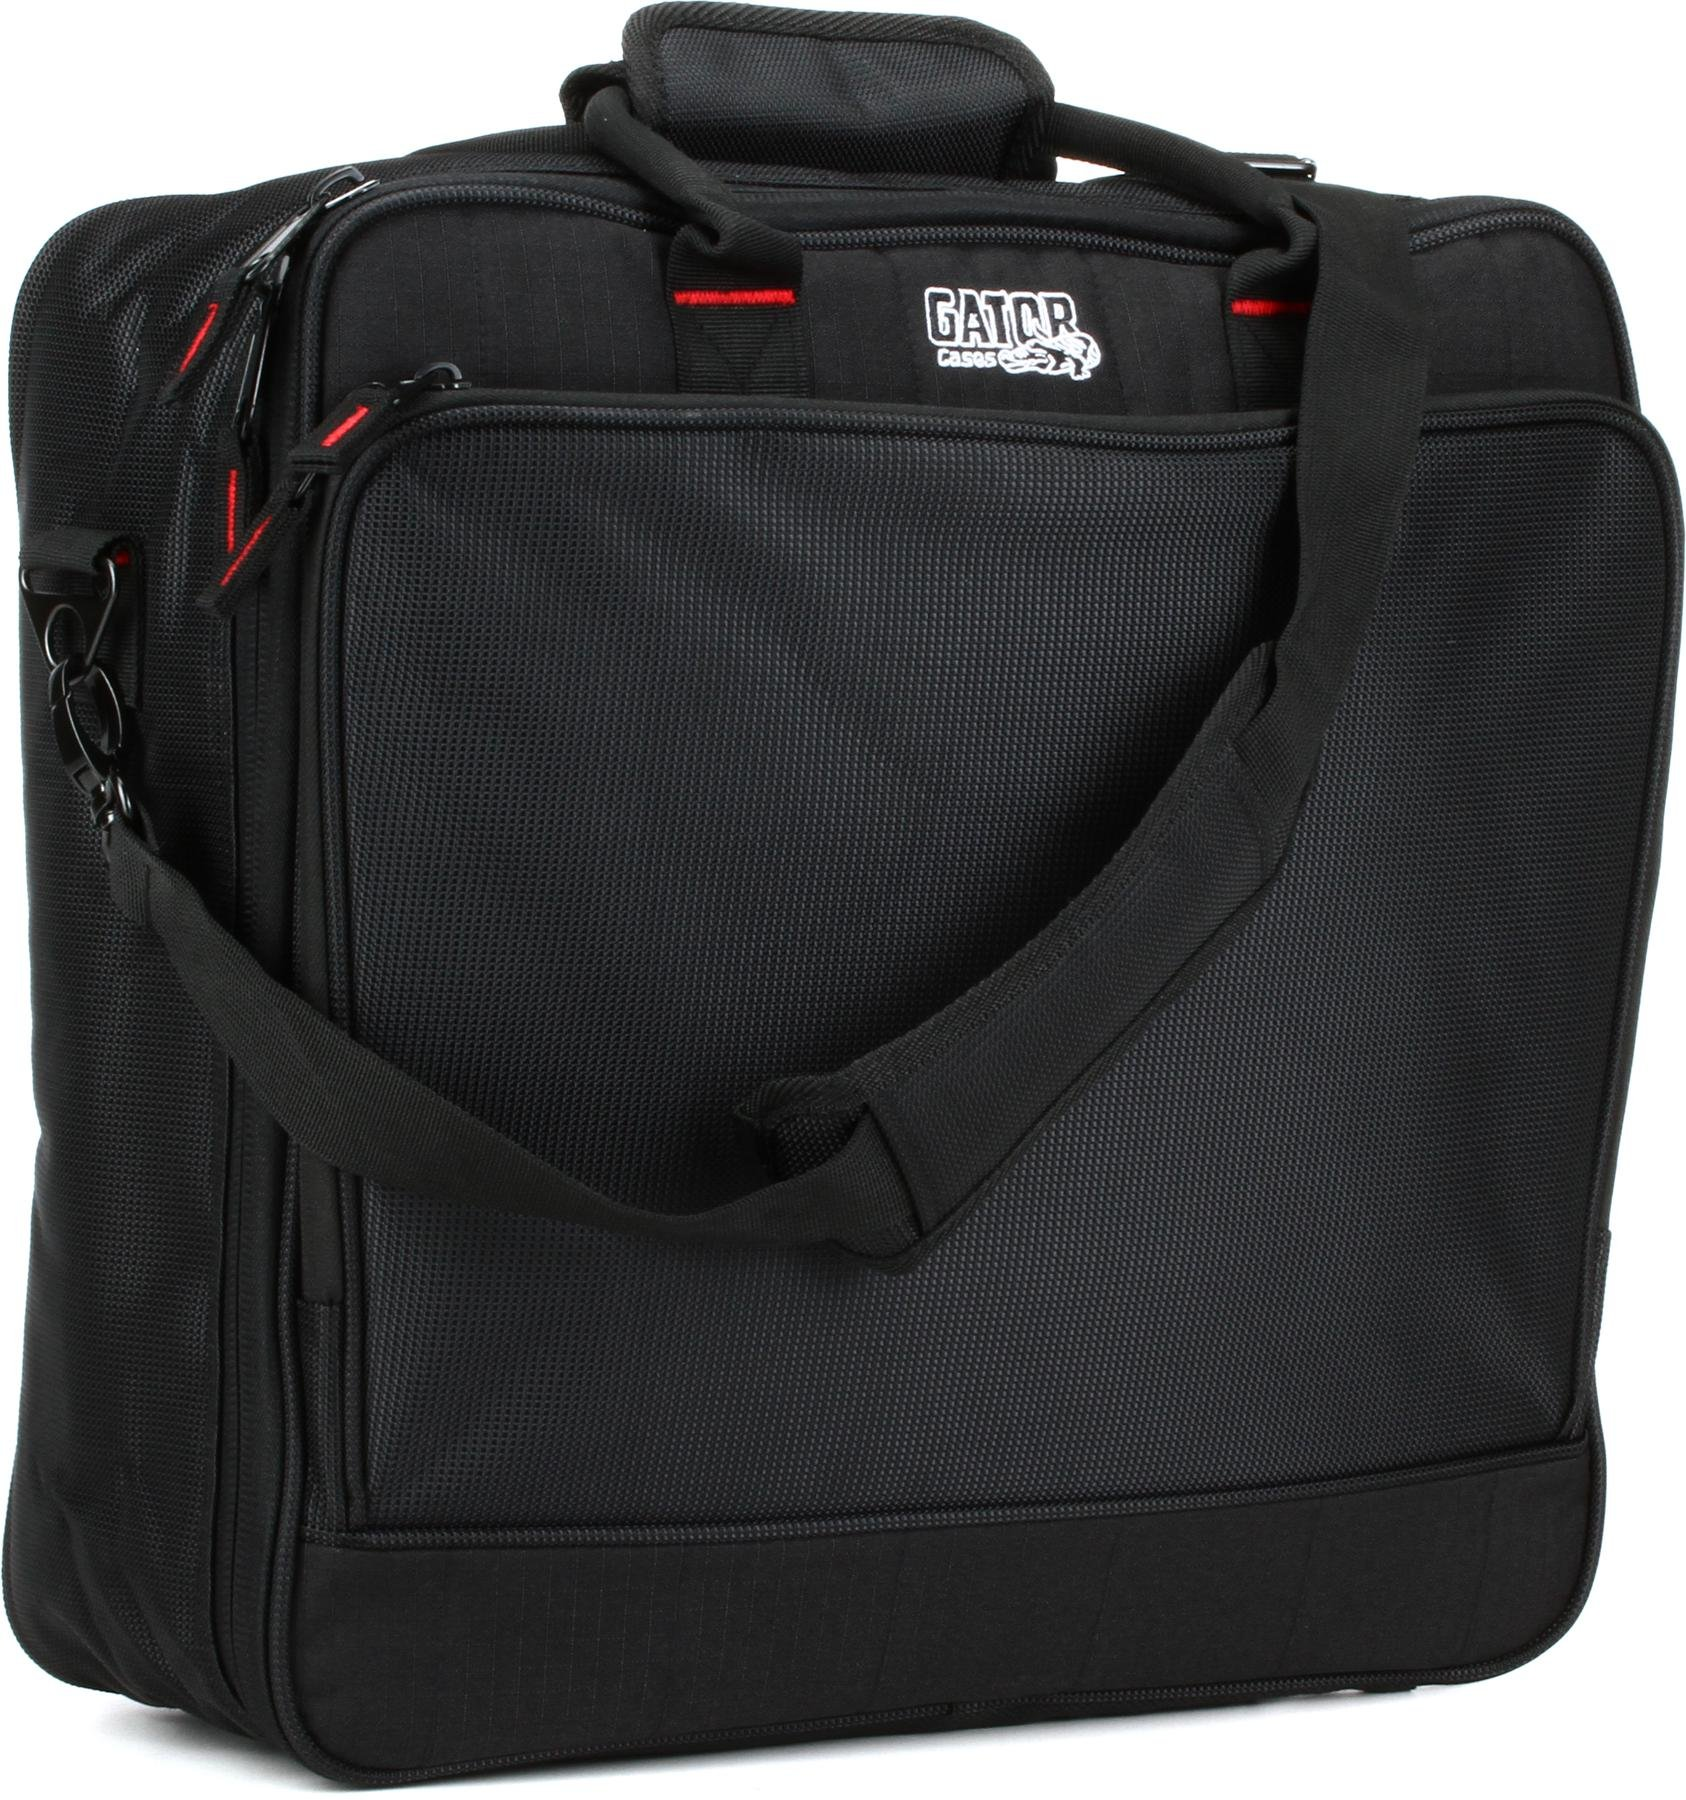 Gator G-MIXERBAG-1515 Mixer Bag | Sweetwater